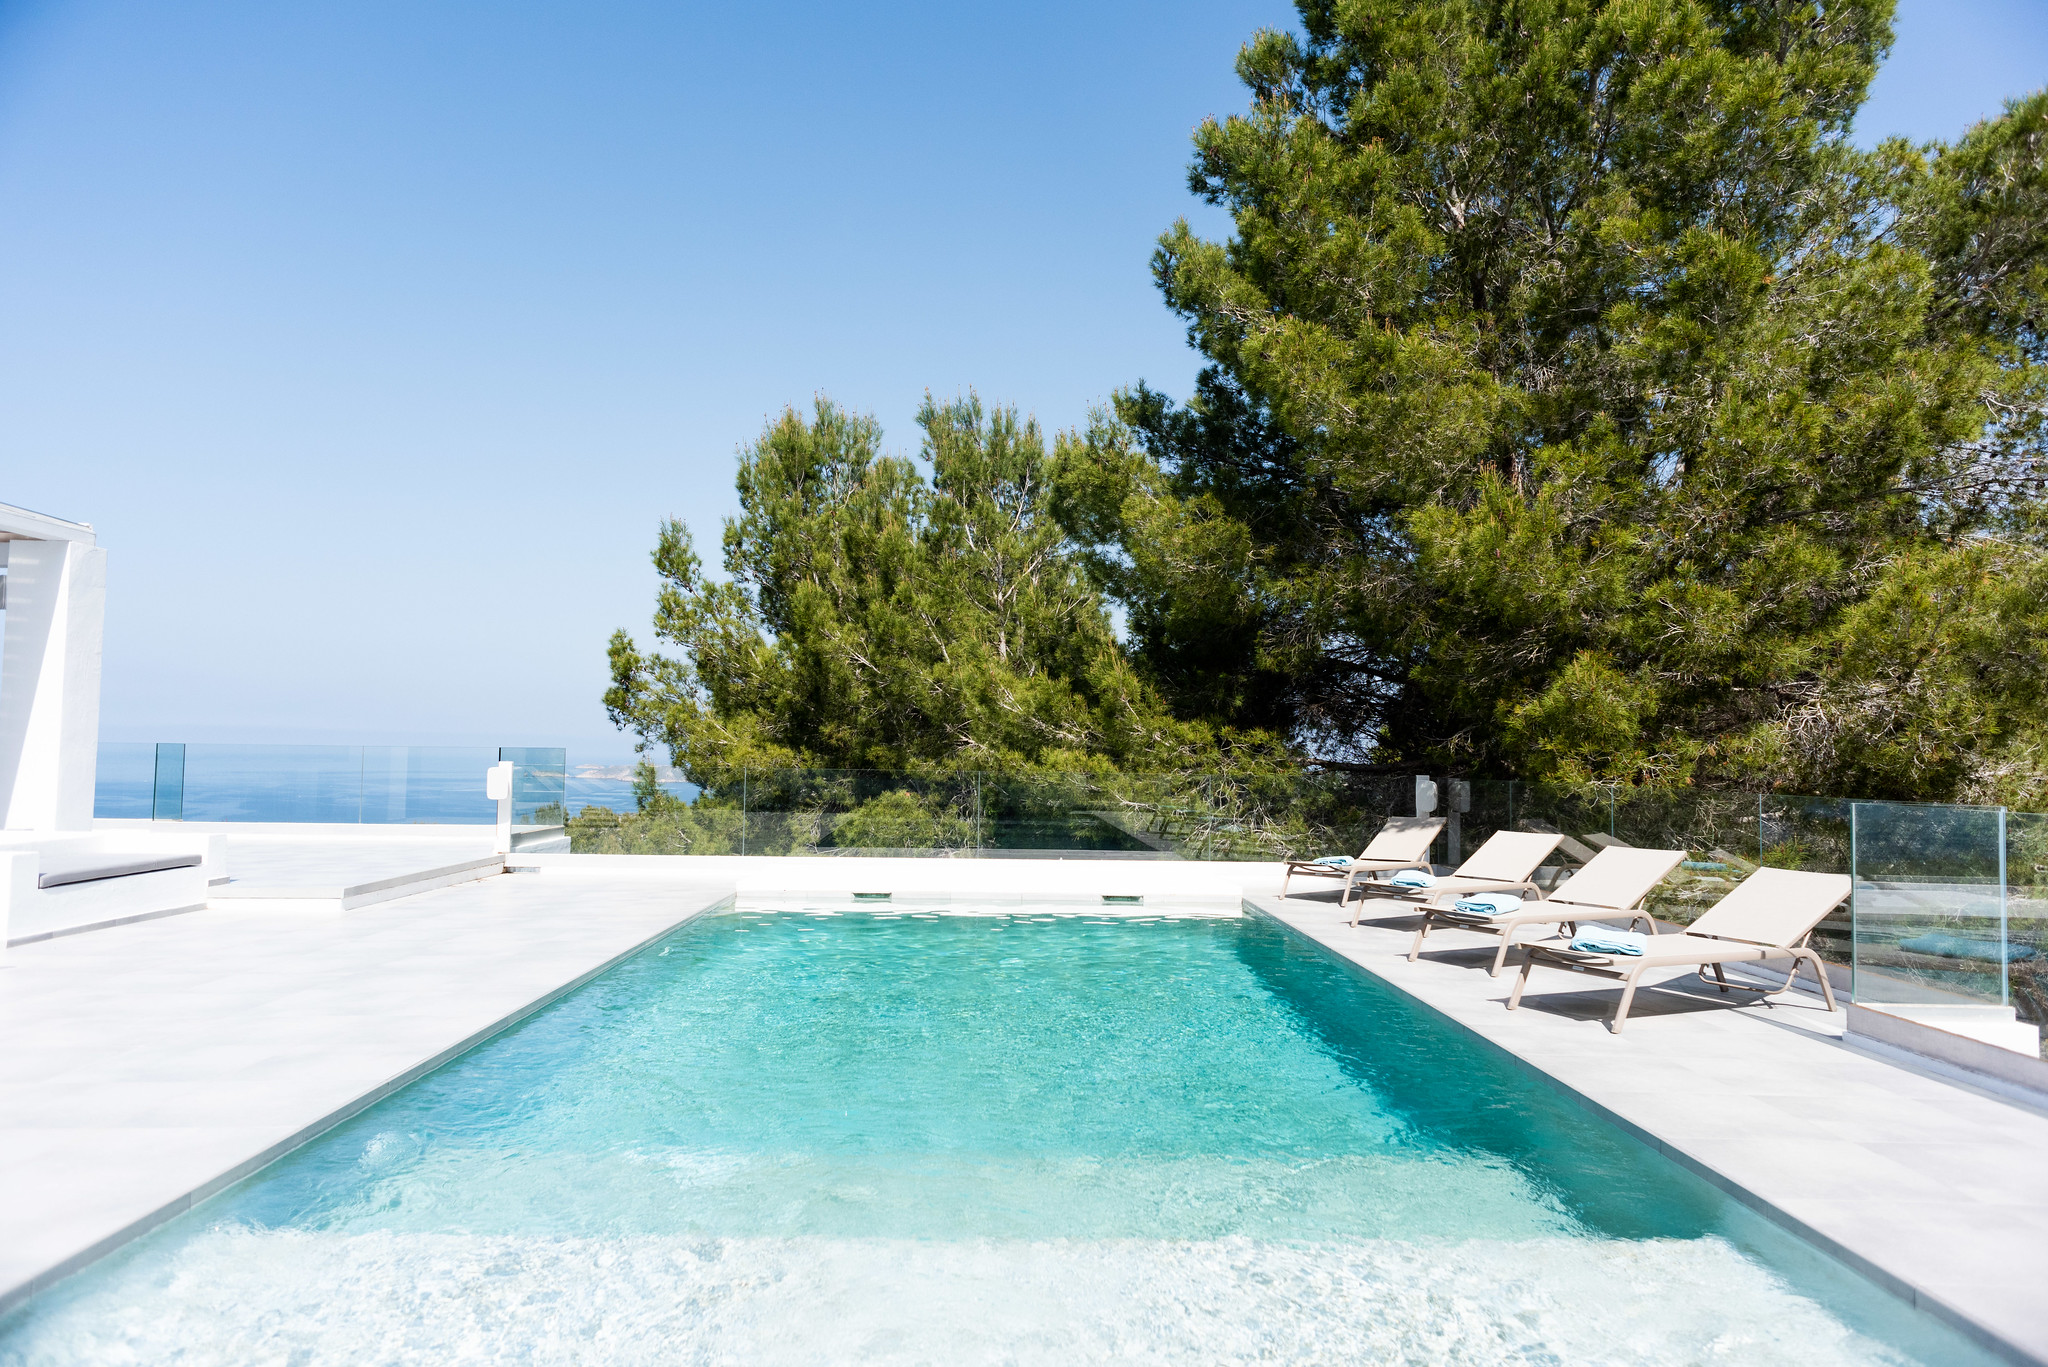 https://www.white-ibiza.com/wp-content/uploads/2020/05/white-ibiza-villas-can-dela-pool-length.jpg